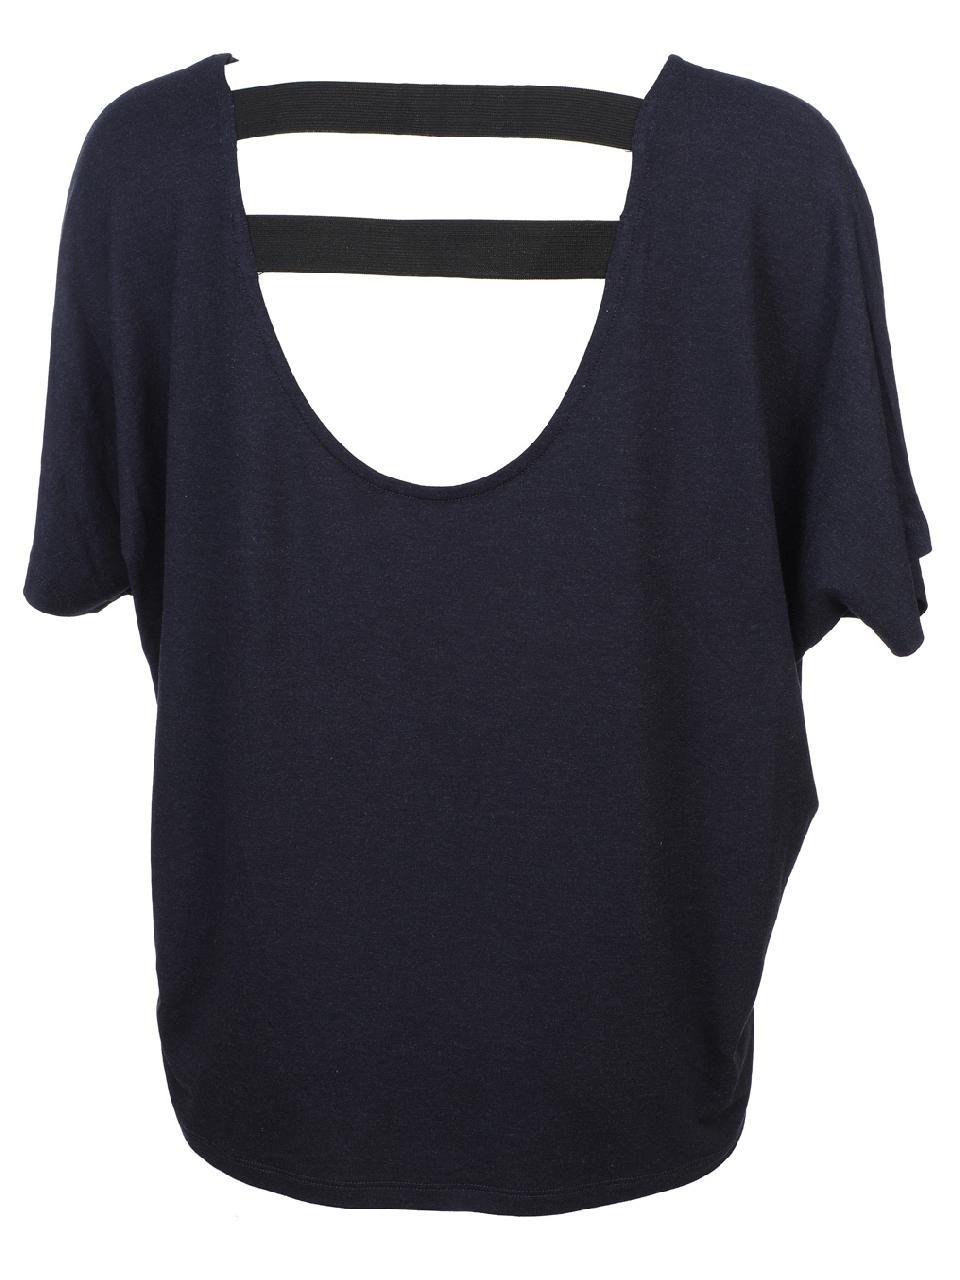 Tee-shirt-manches-courtes-Only-Moster-strap-nv-mc-tee-l-Bleu-43825-Neuf miniature 4